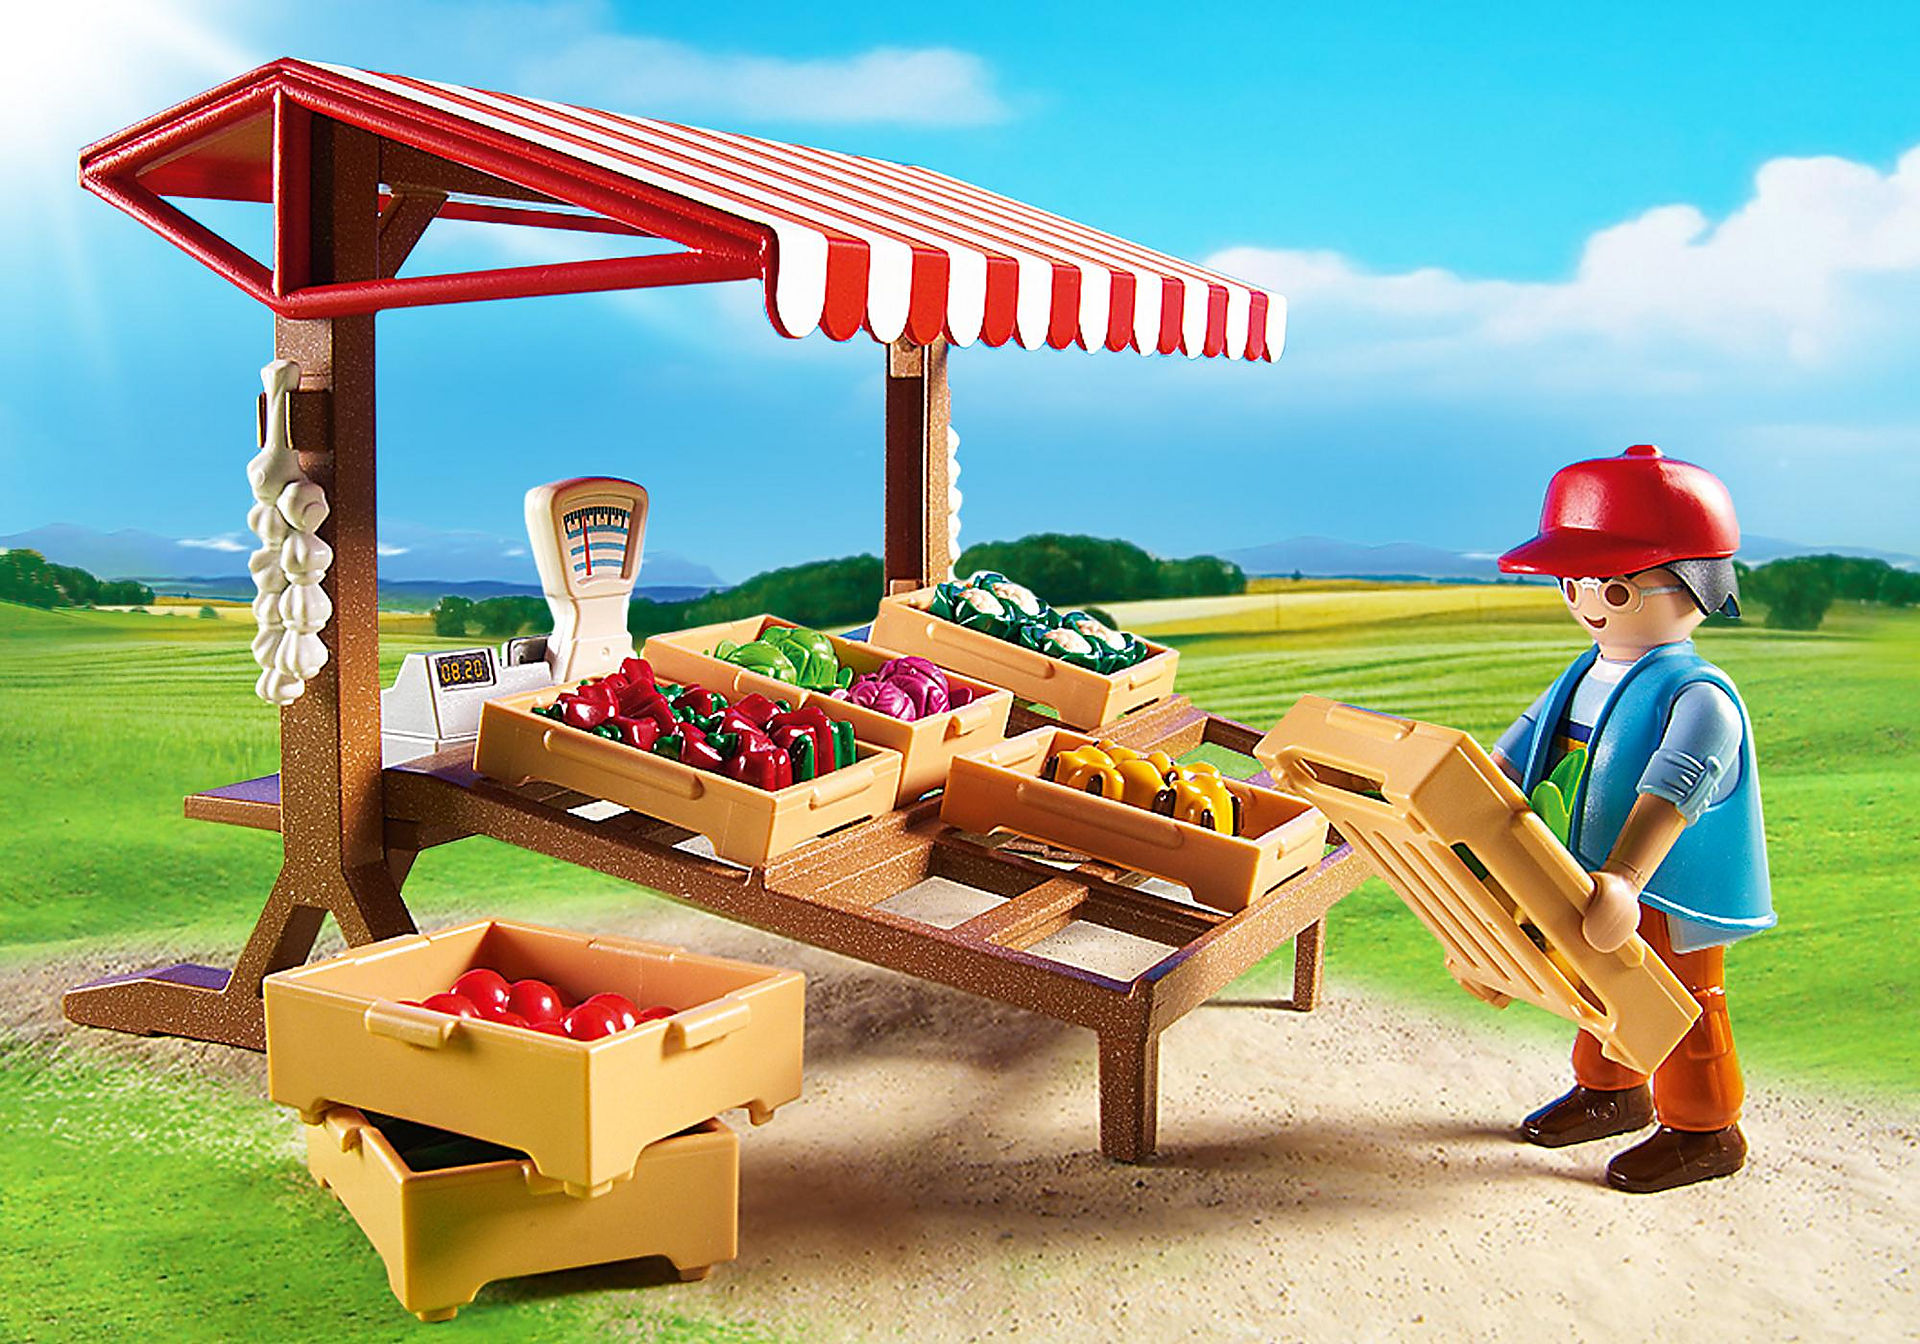 http://media.playmobil.com/i/playmobil/6121_product_extra2/Gemüsestand